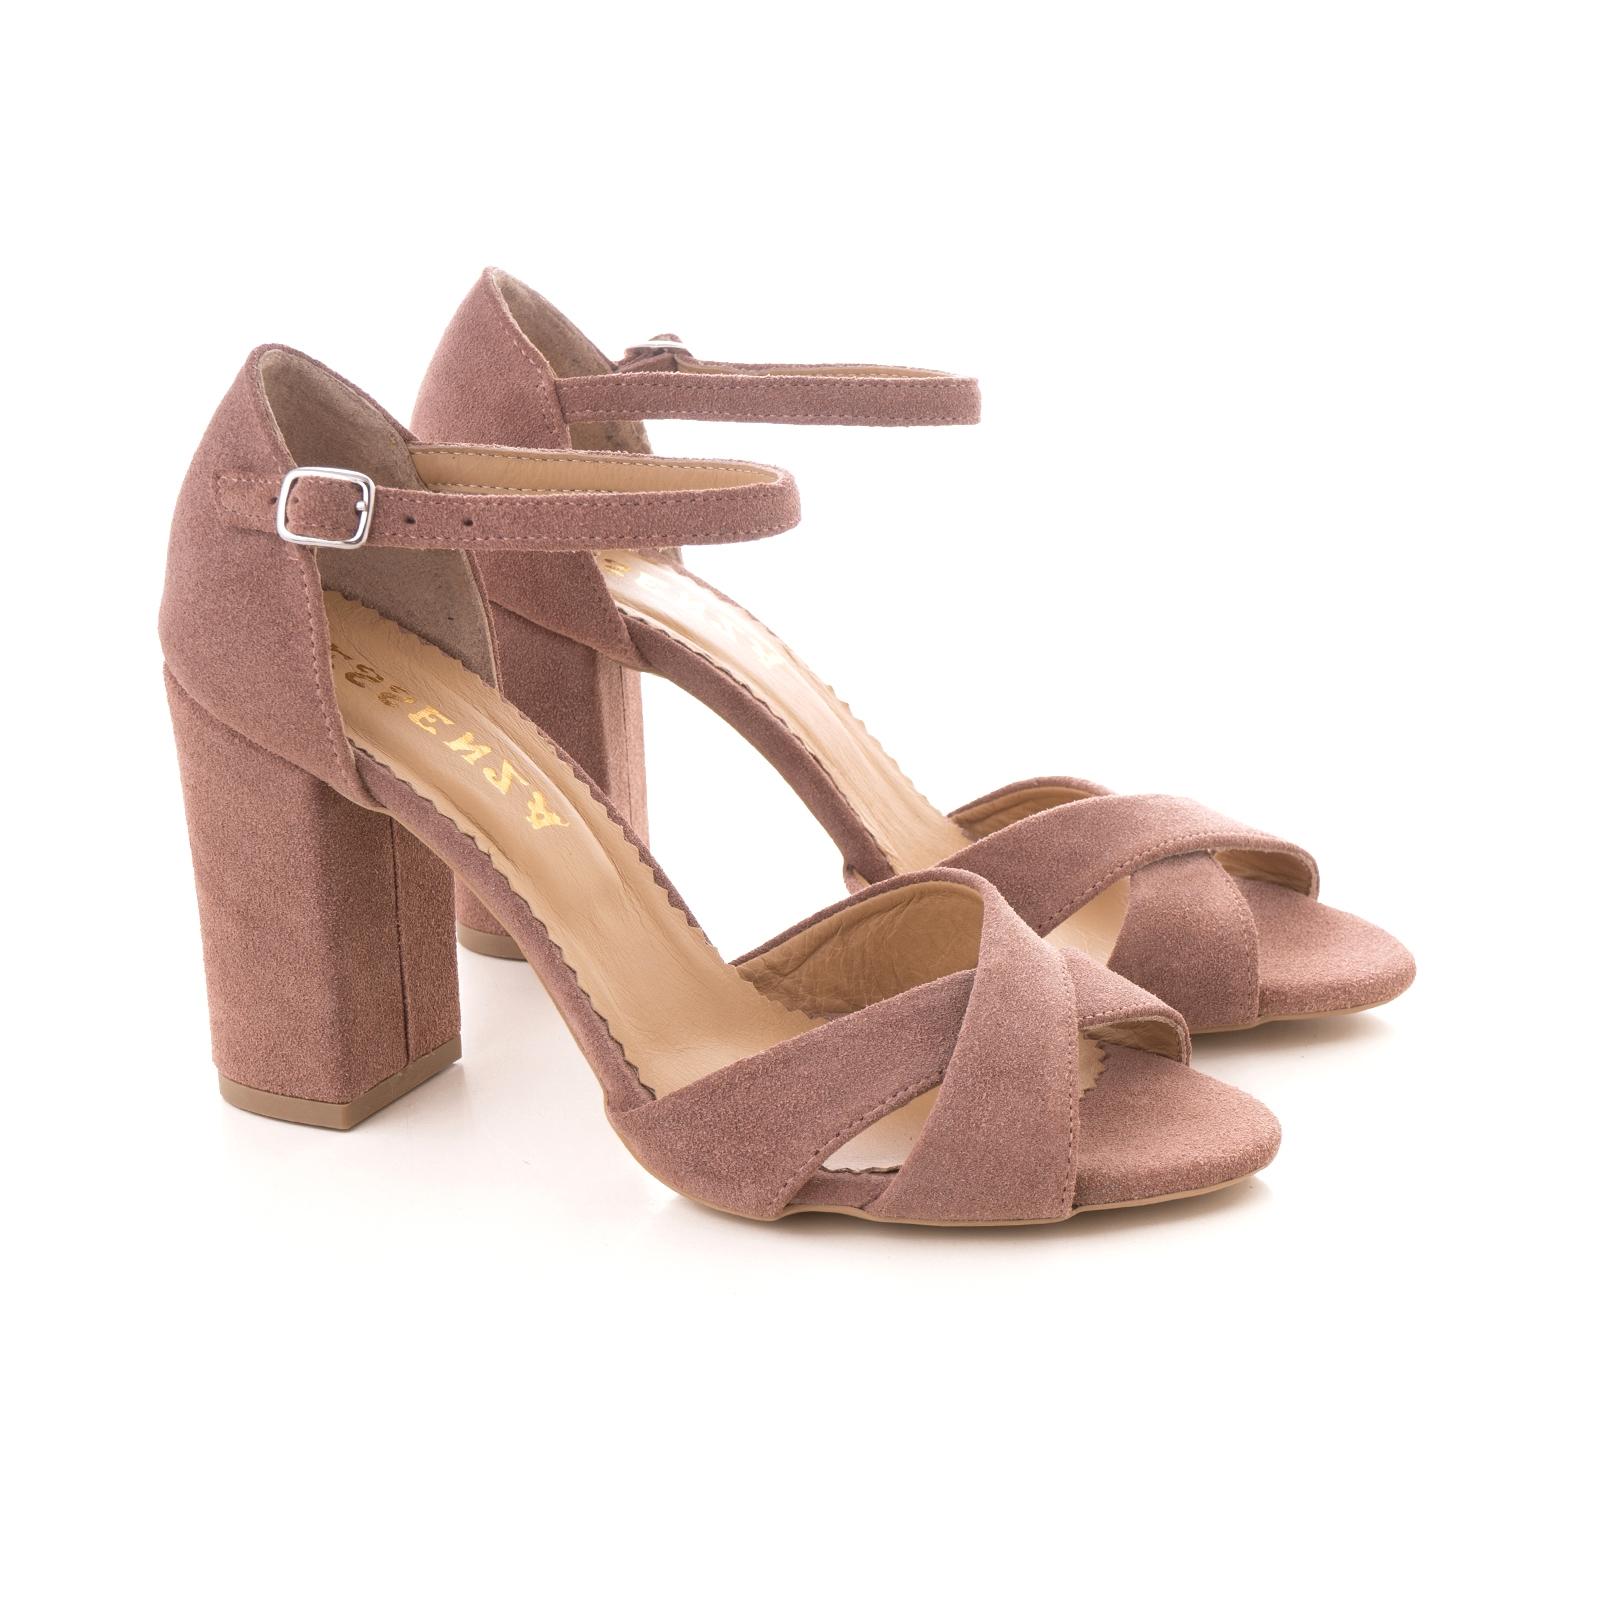 Sandale din piele intoarsa roz somon